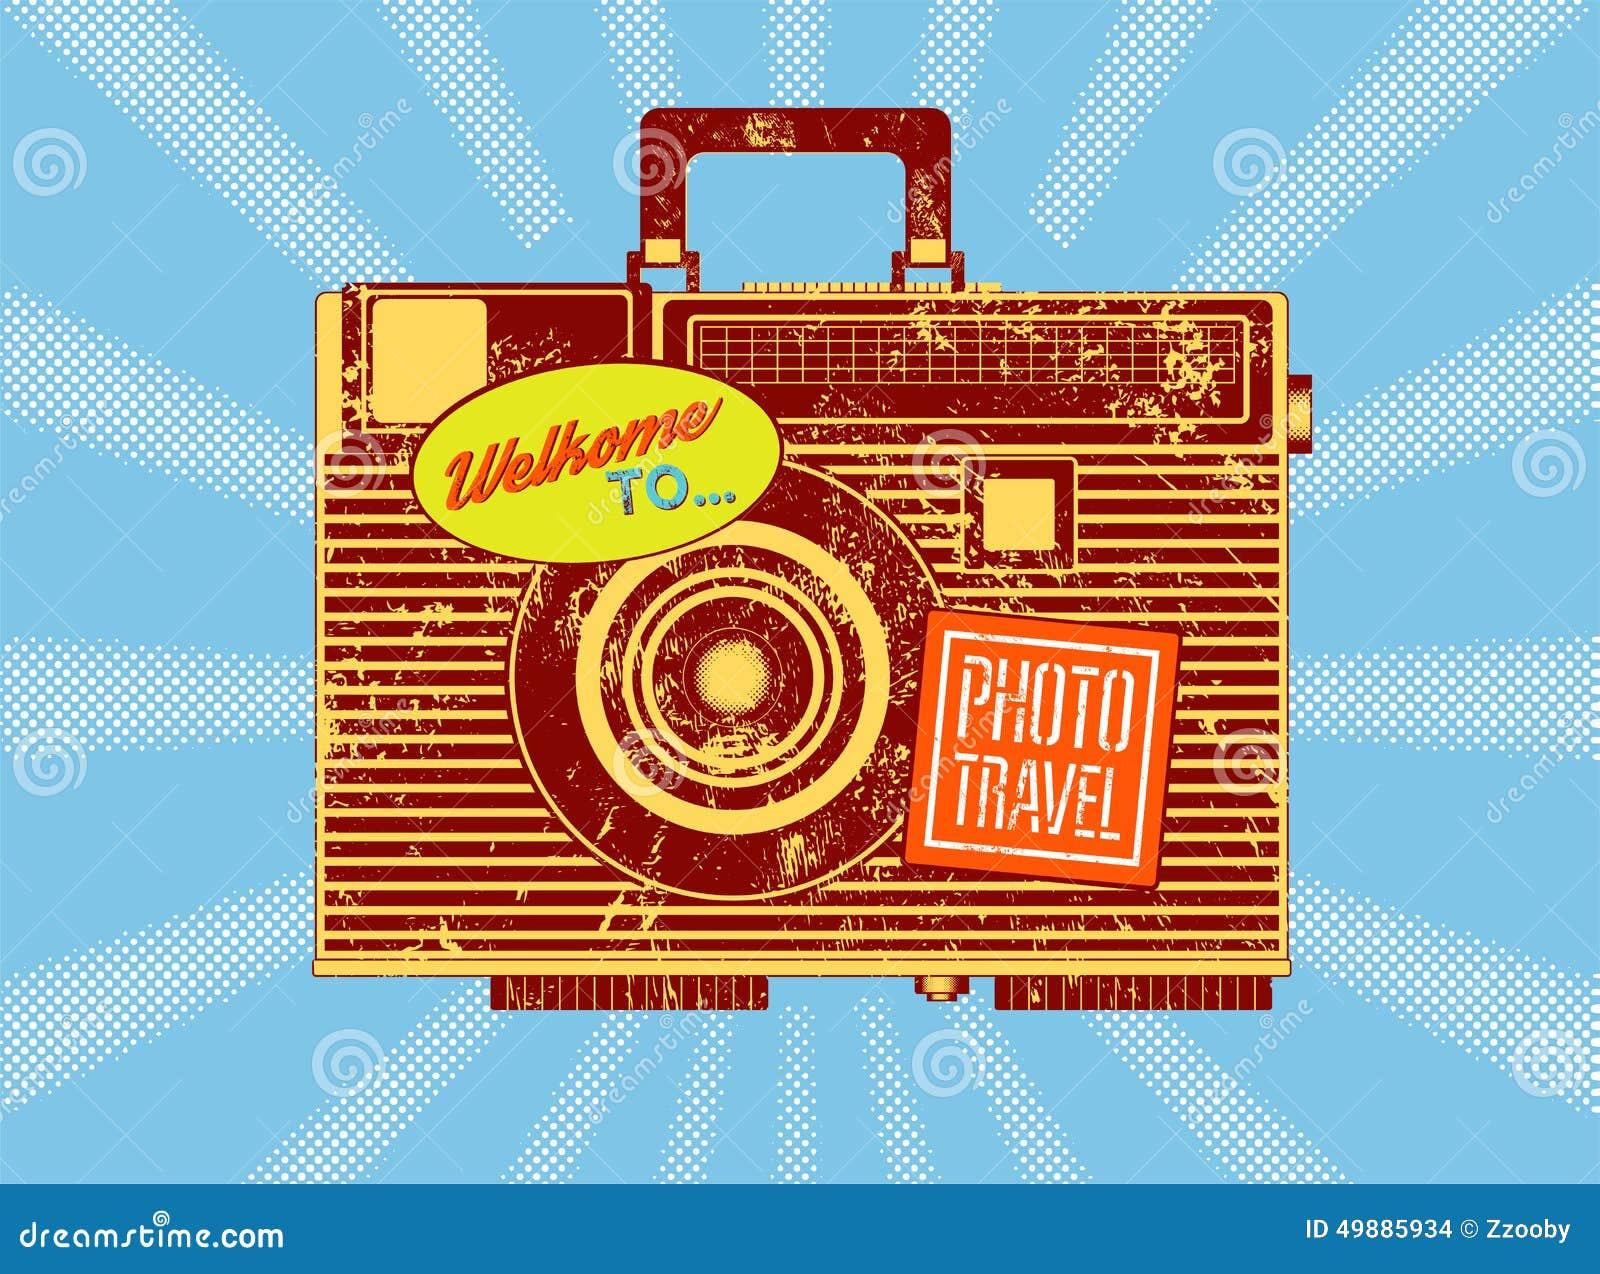 Grunge Camera Vector : Photo travel. vintage camera suitcase. retro grunge style poster